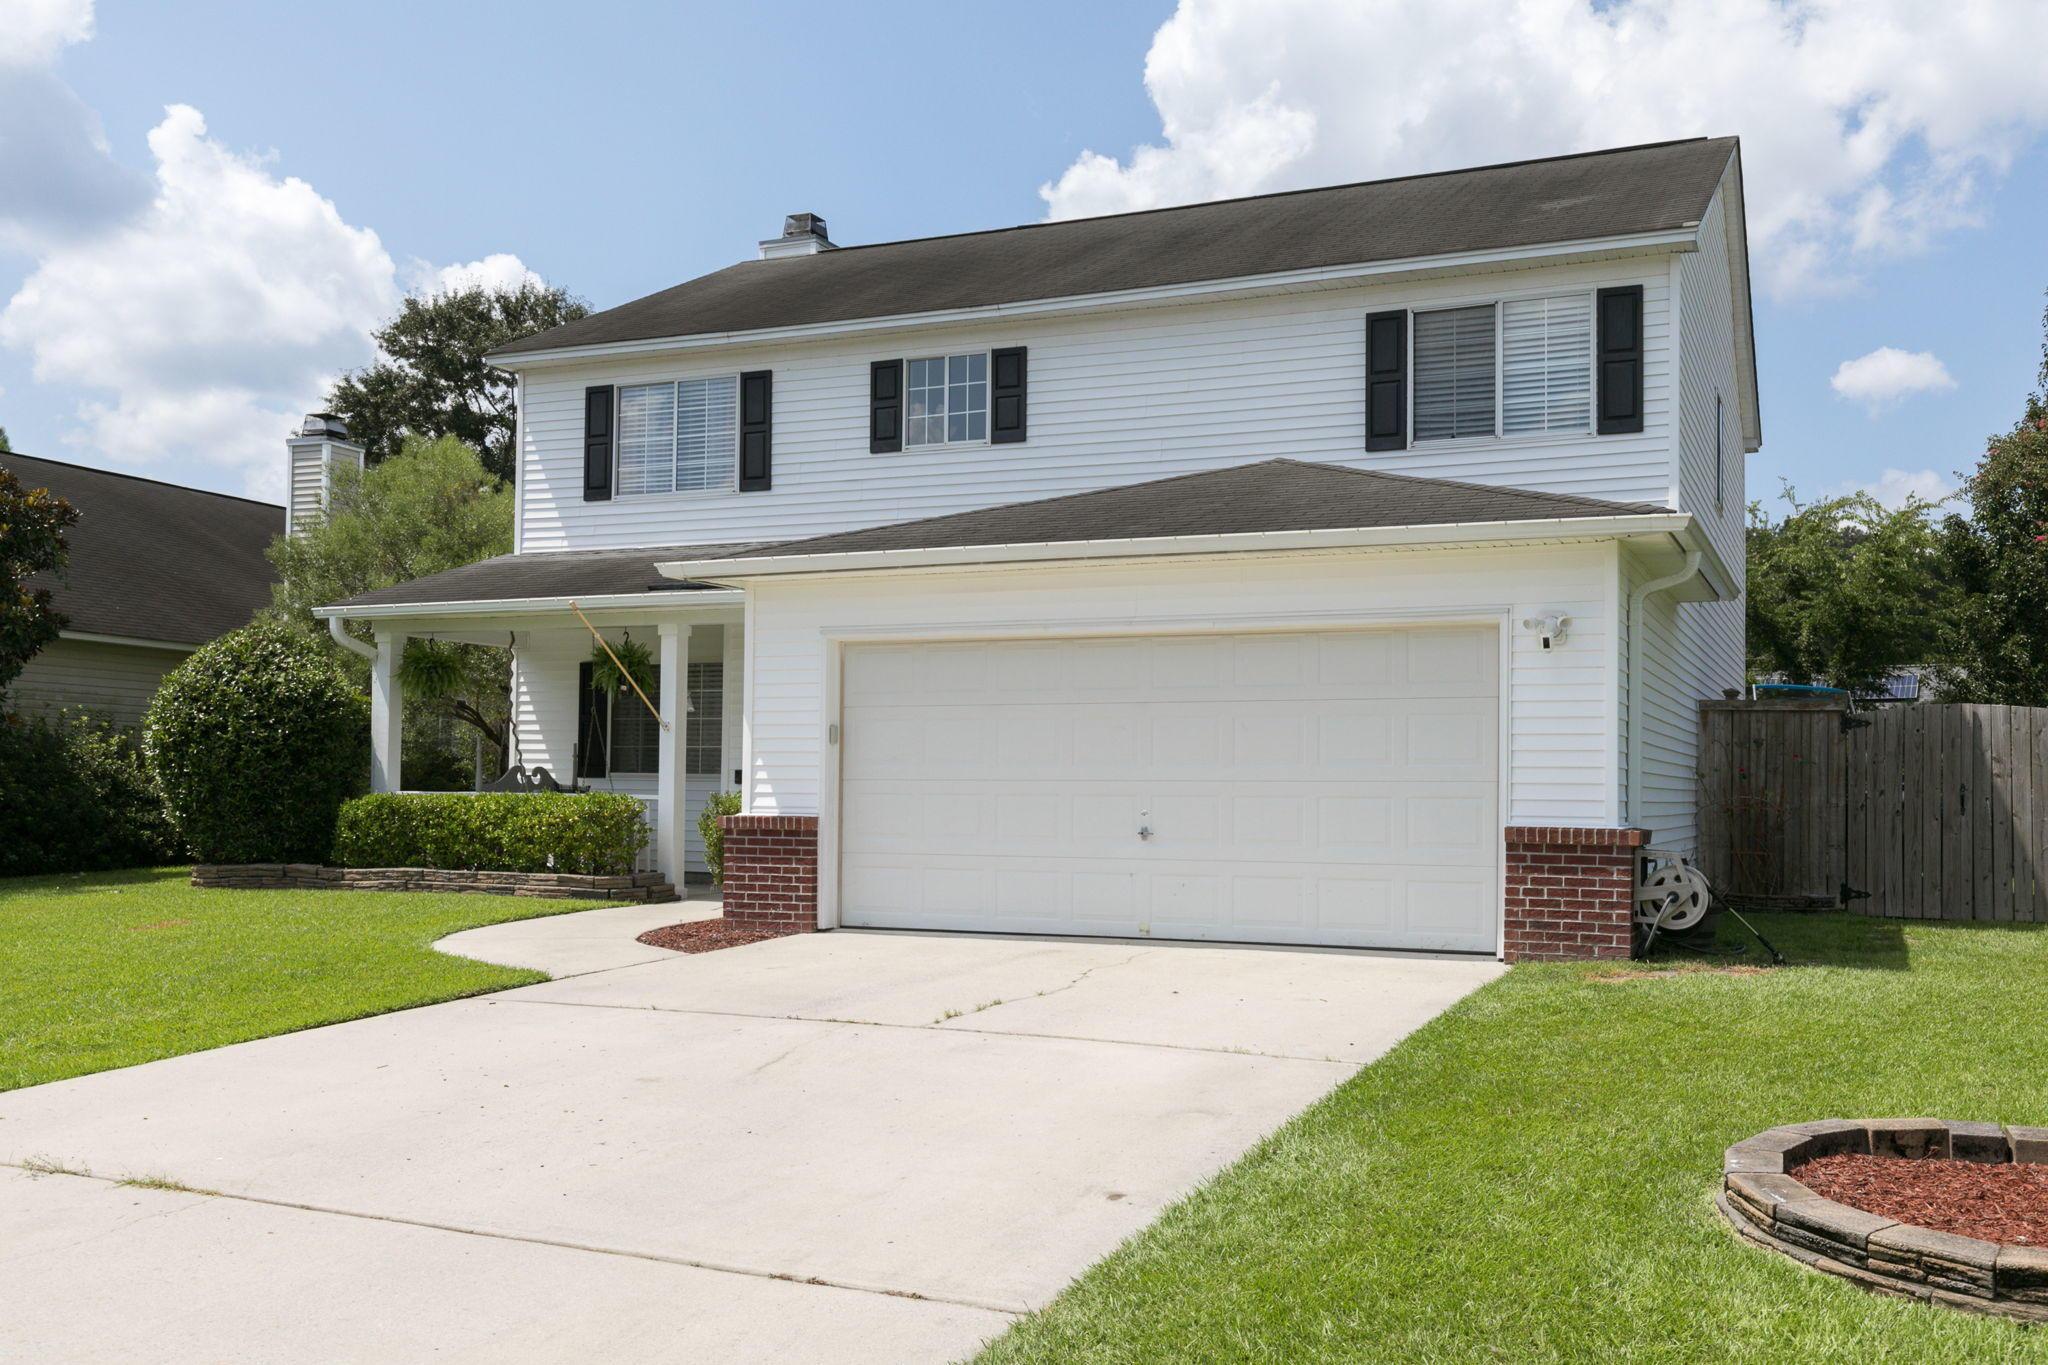 Bridges of Summerville Homes For Sale - 25 Regency Oaks, Summerville, SC - 33